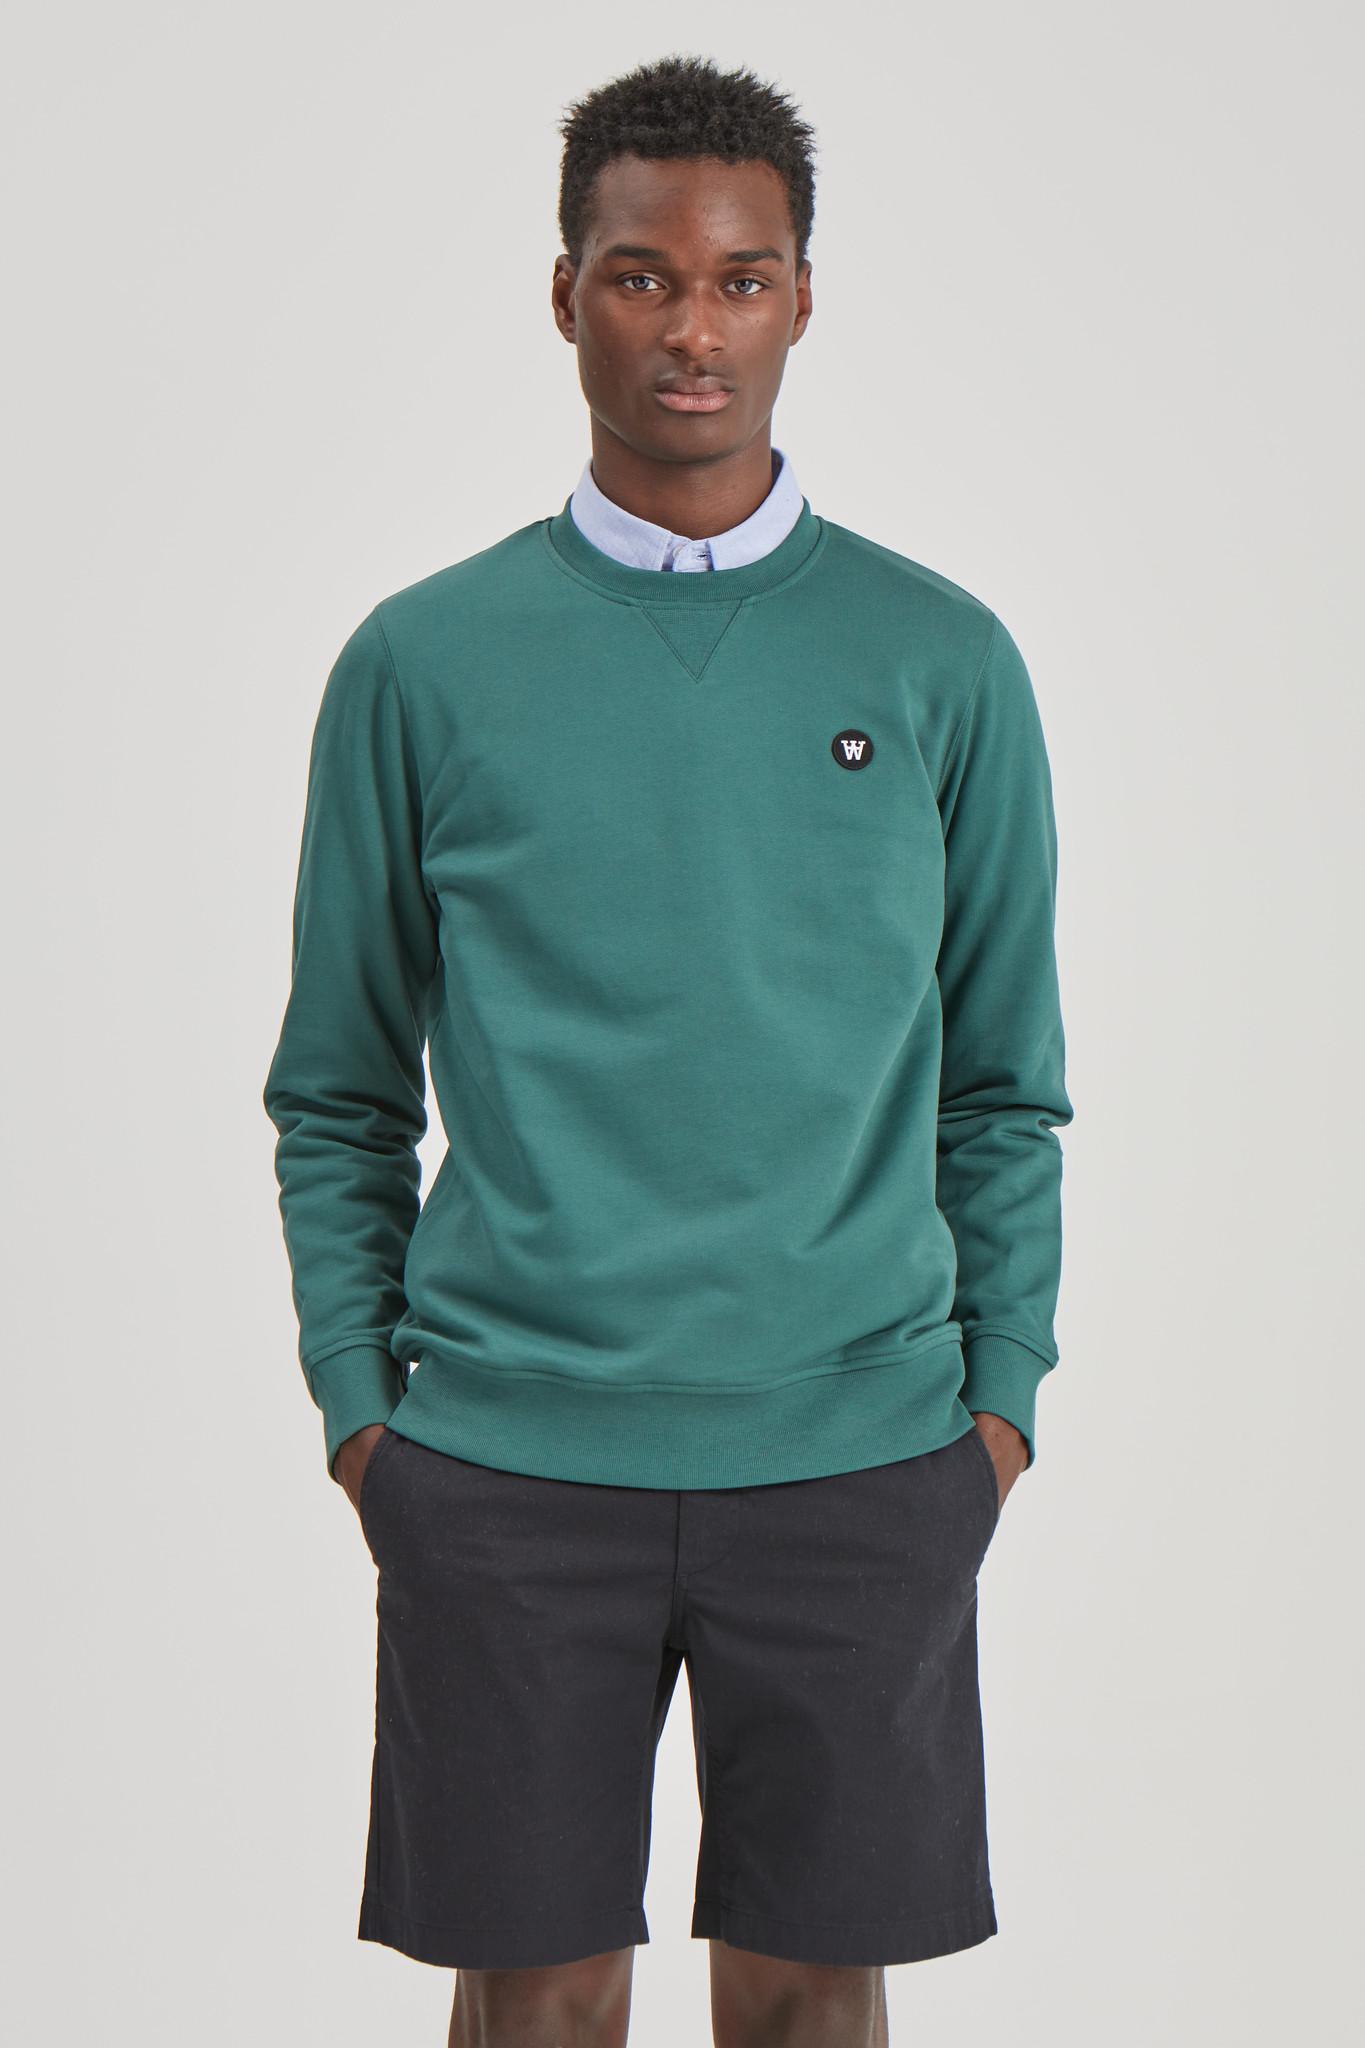 Tye katoenen Sweatshirt Gewassen Groen-3